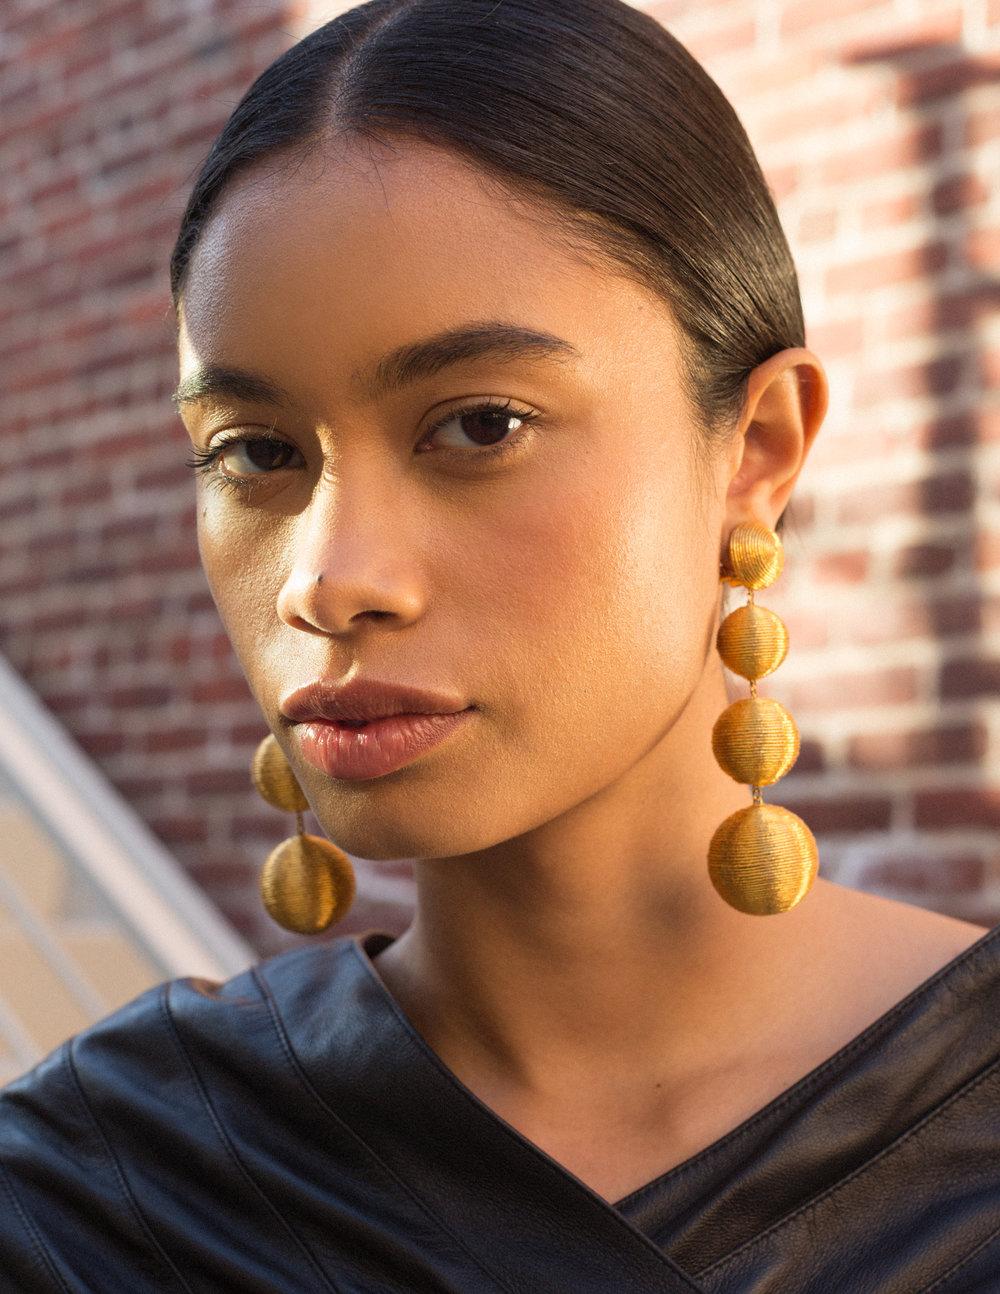 RDR earrings